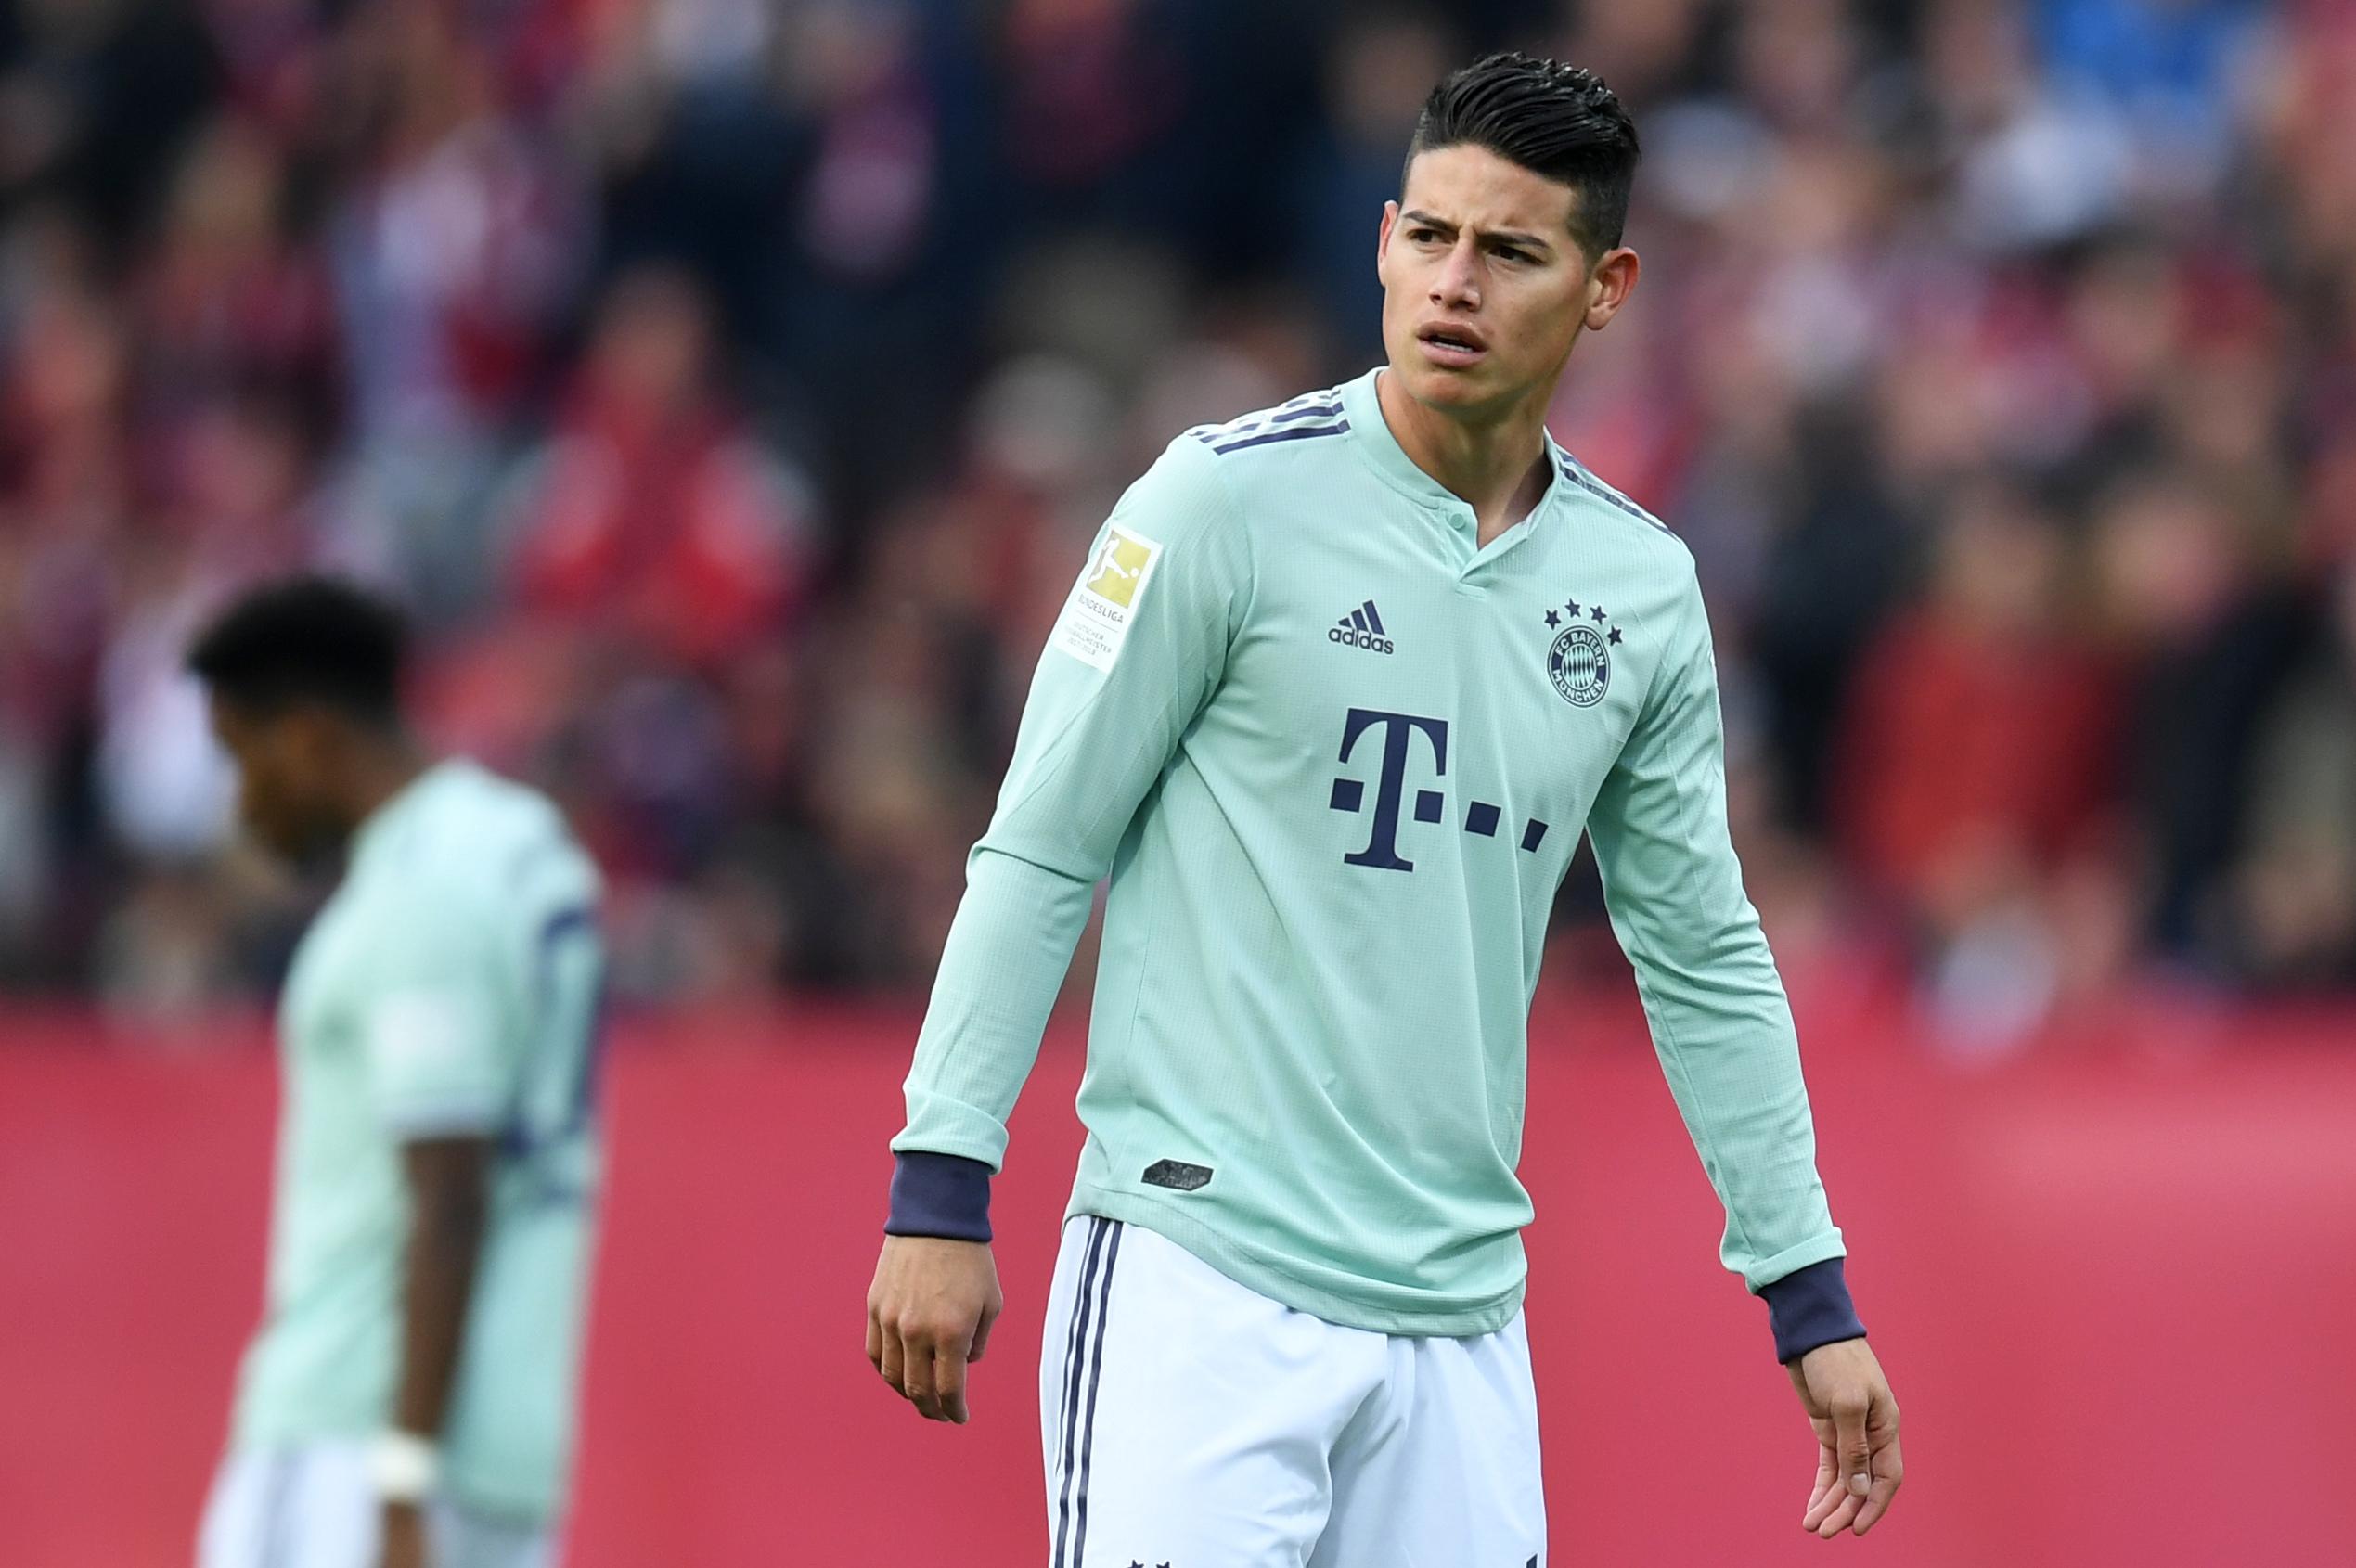 Karl Heinz Rummenigge Discusses Bayern Munich S Plan For James Rodriguez Bleacher Report Latest News Videos And Highlights